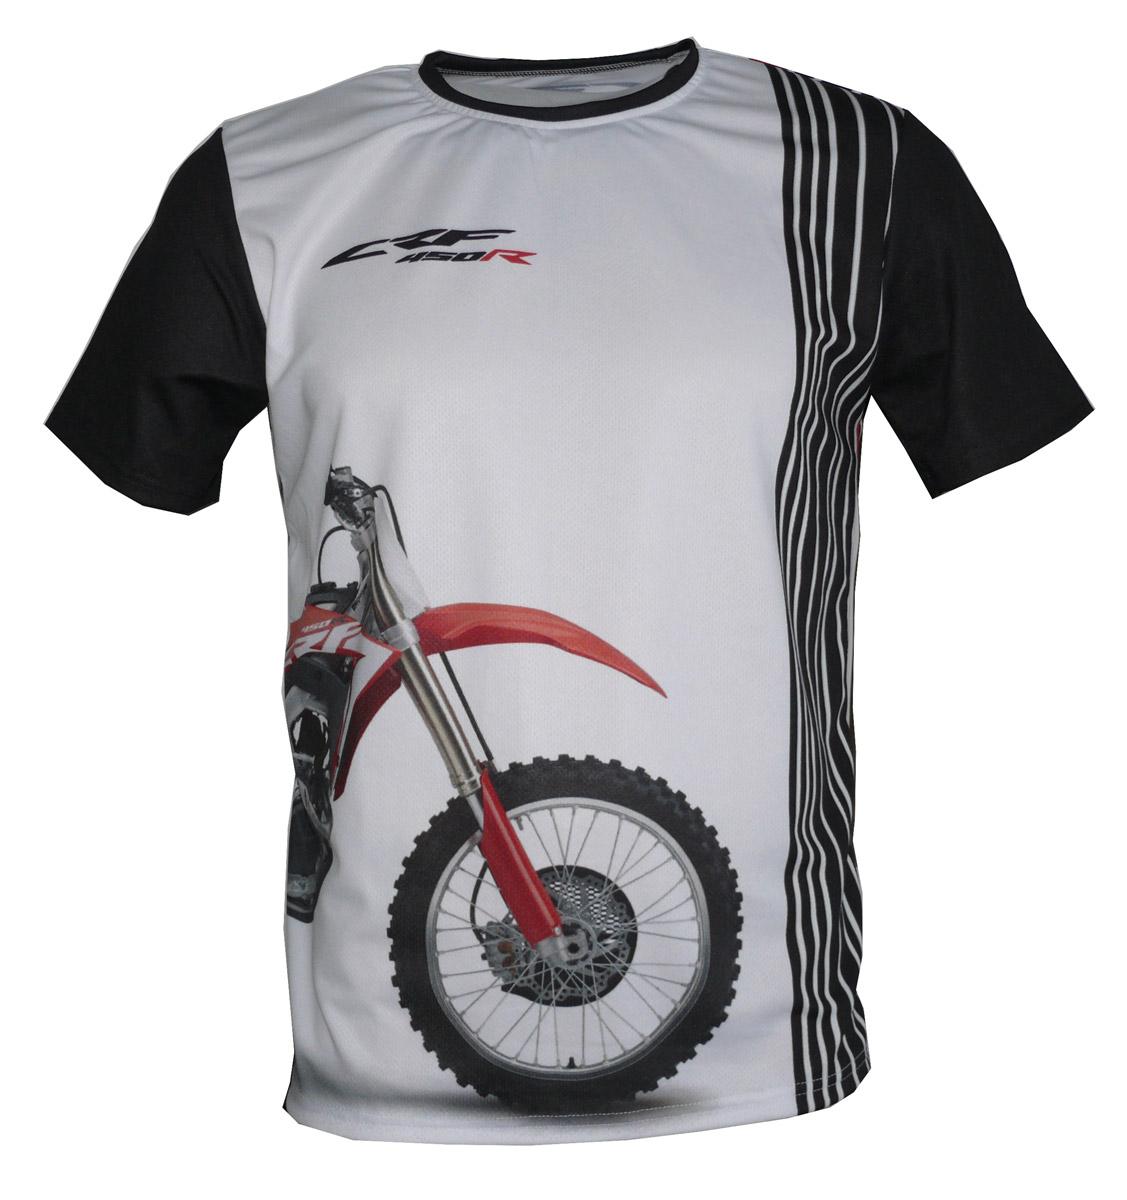 Honda crf 450r 2019 cross bike bike tshirt